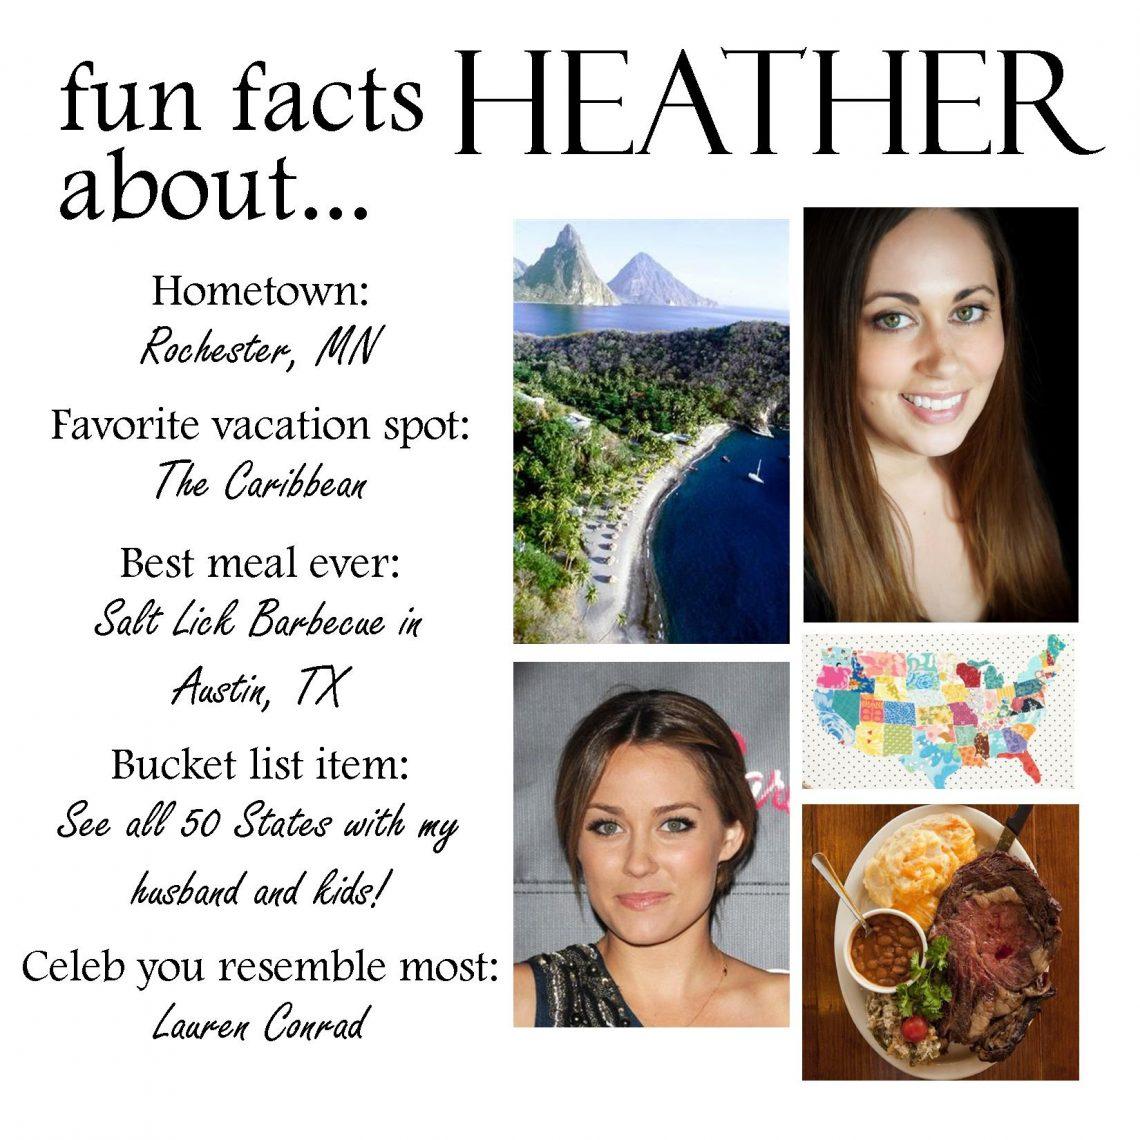 heather ff